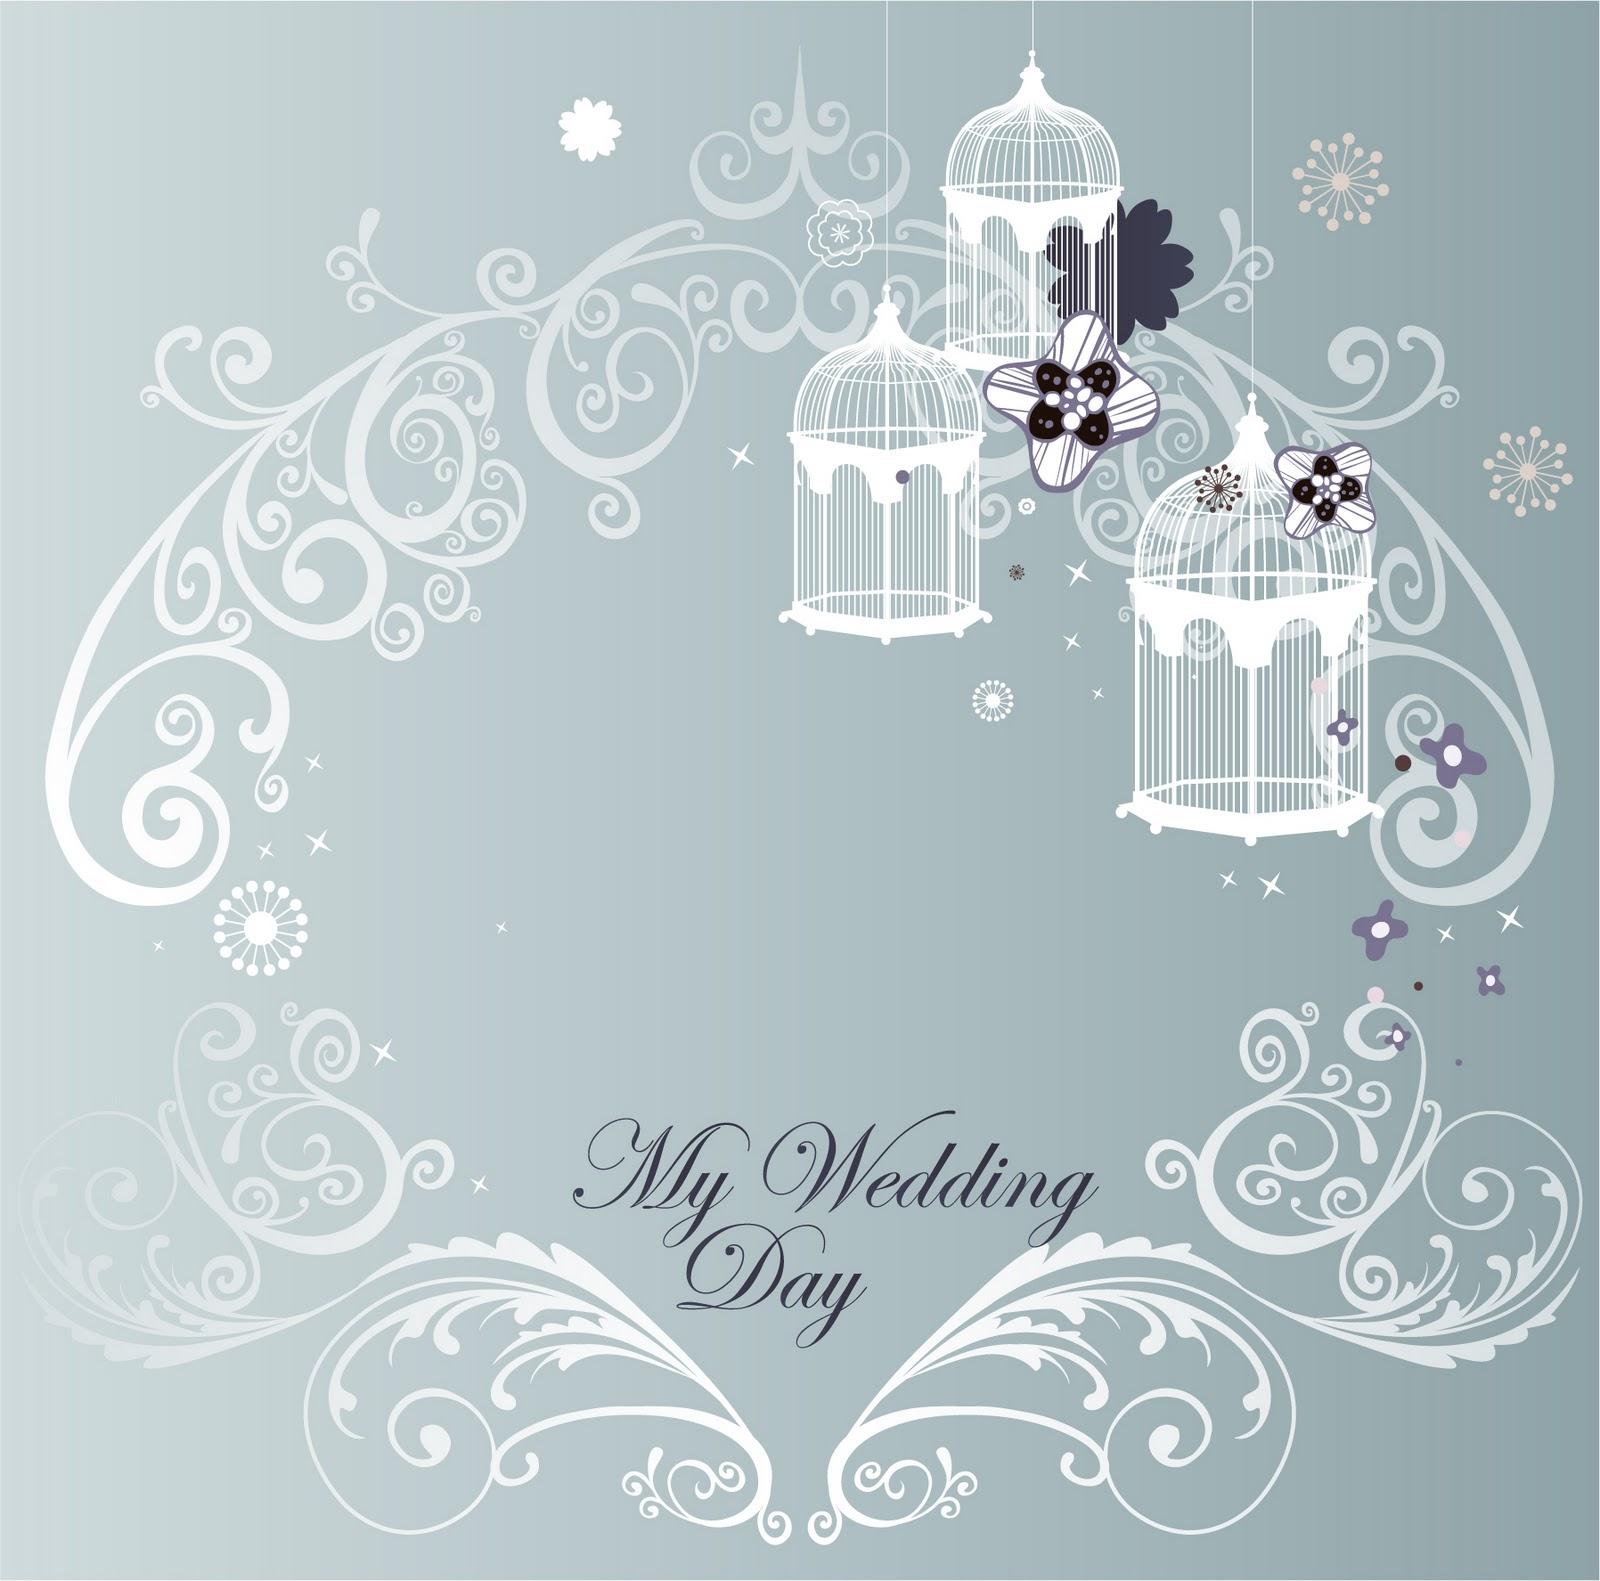 Wedding day vector download 1600x1581